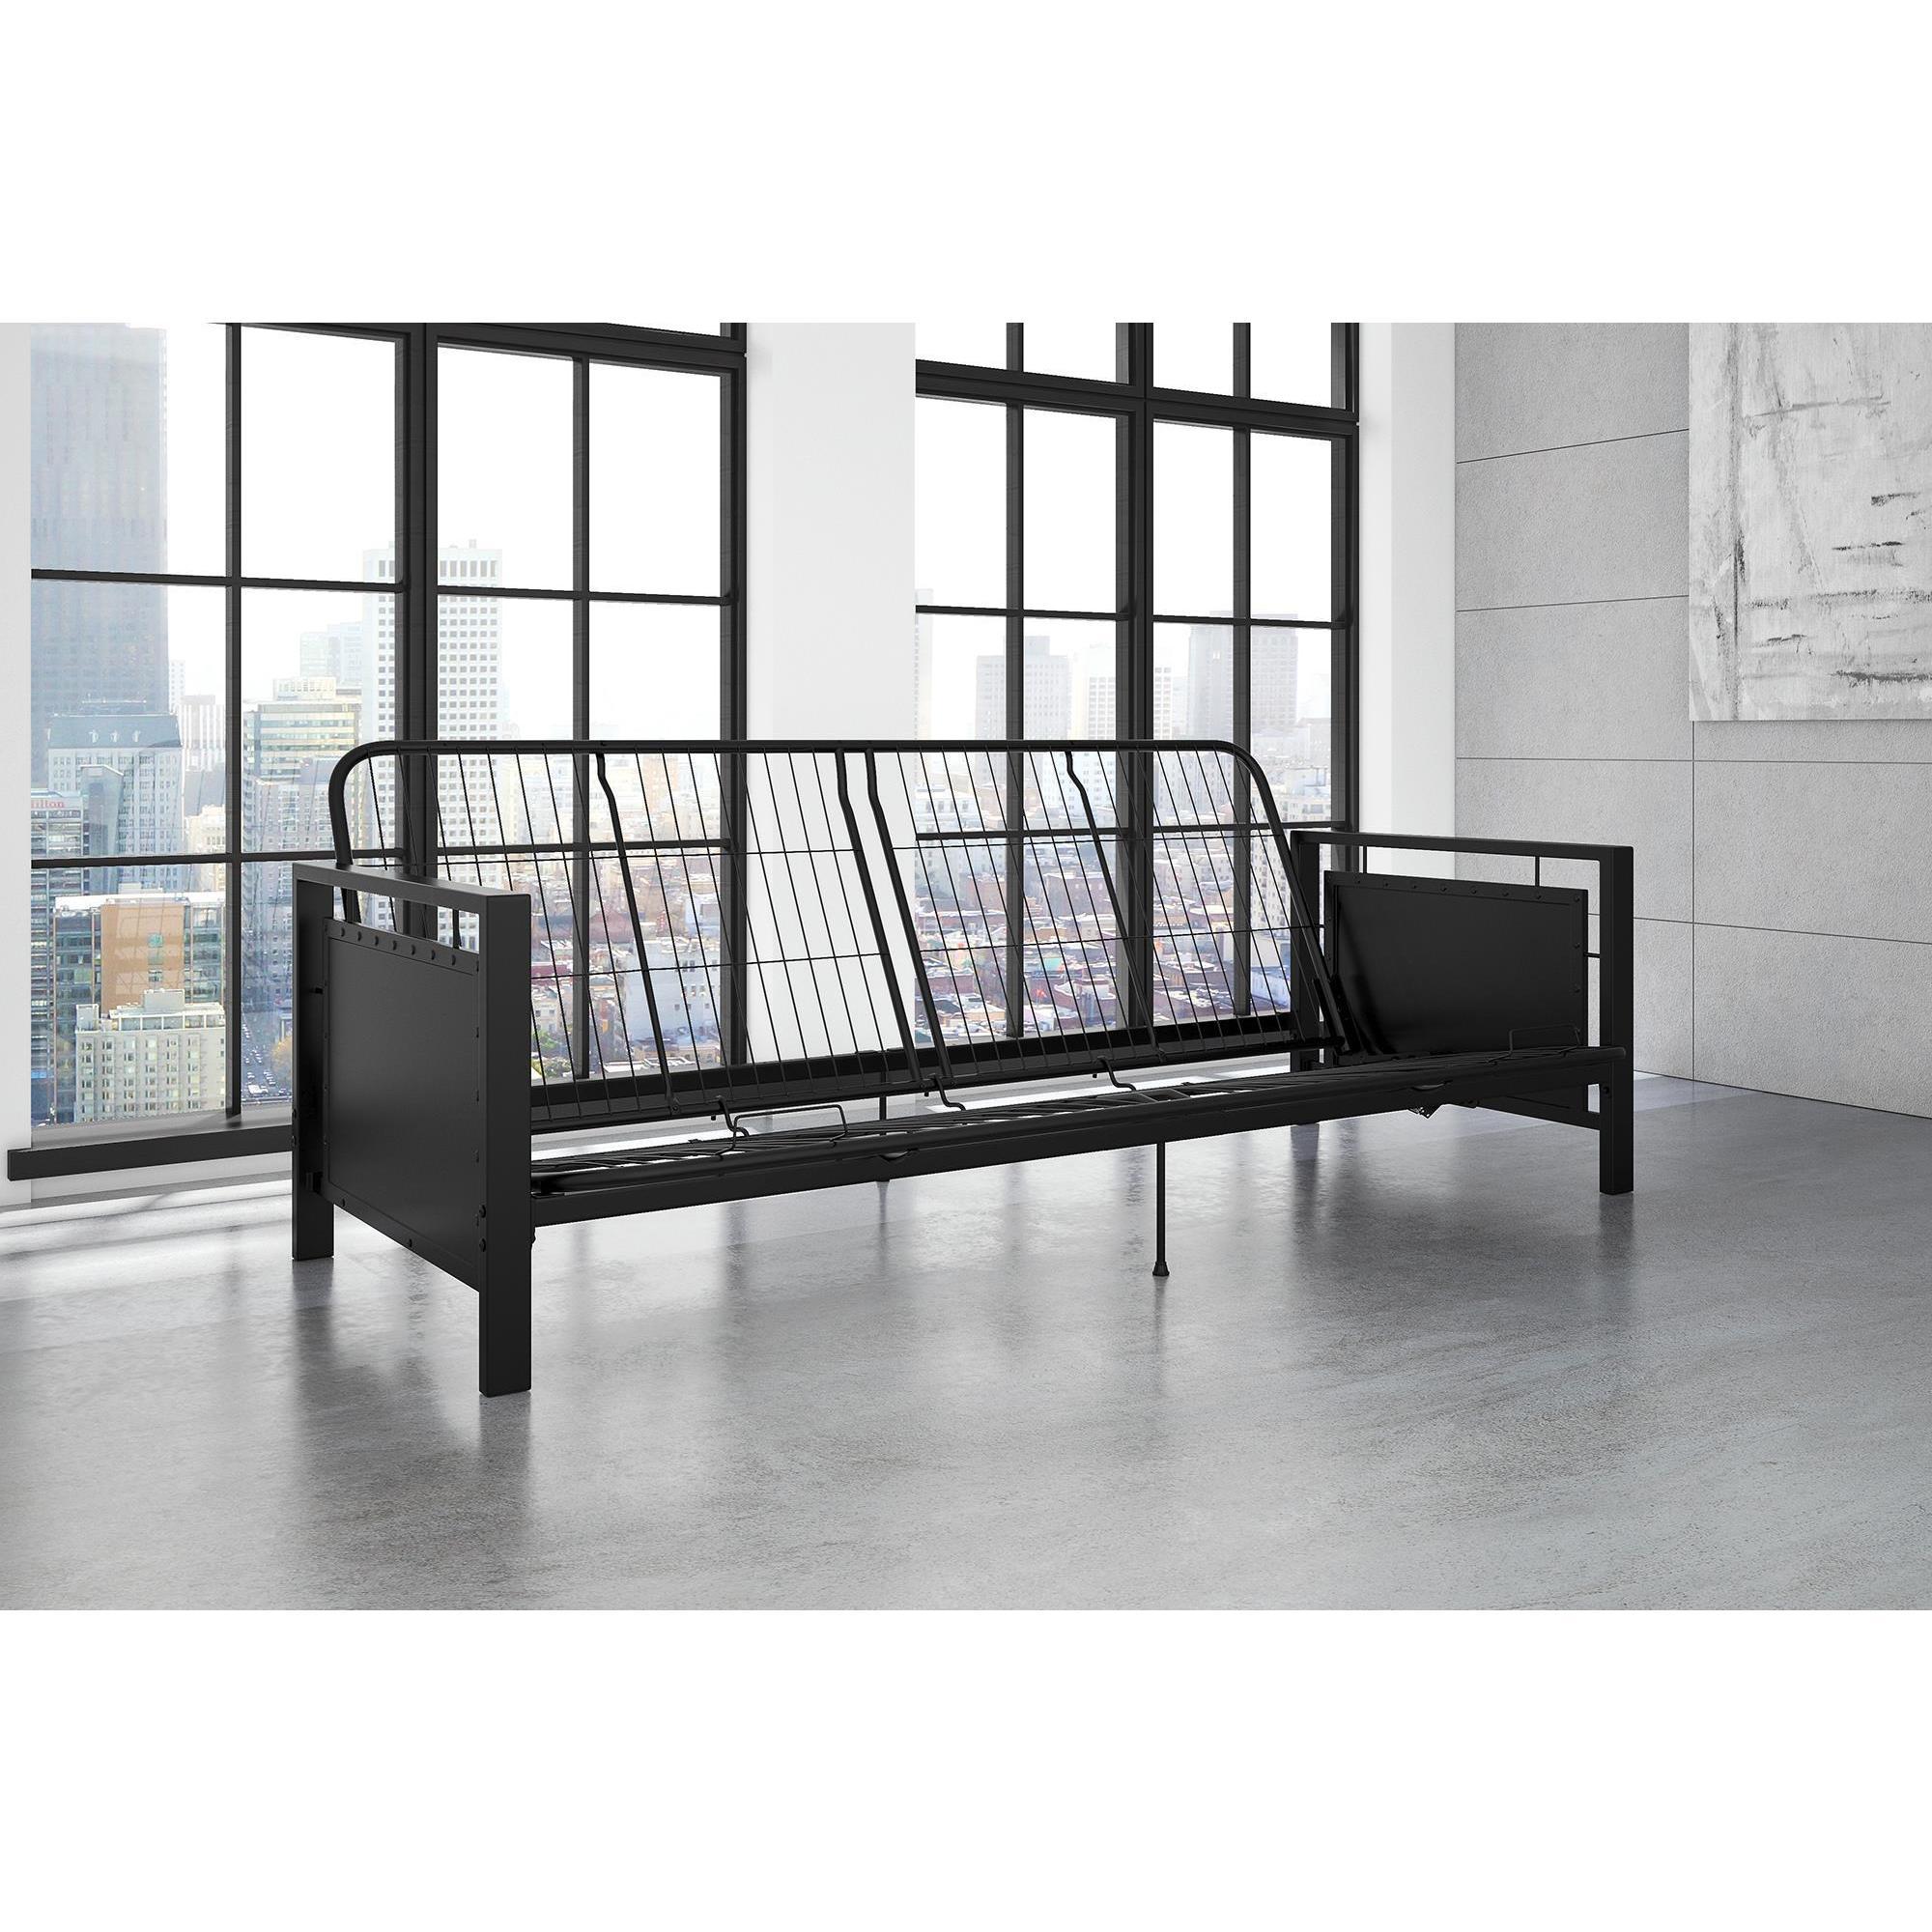 abbyson futon velvet product sofa home regina futons overstock base free today shipping bed garden